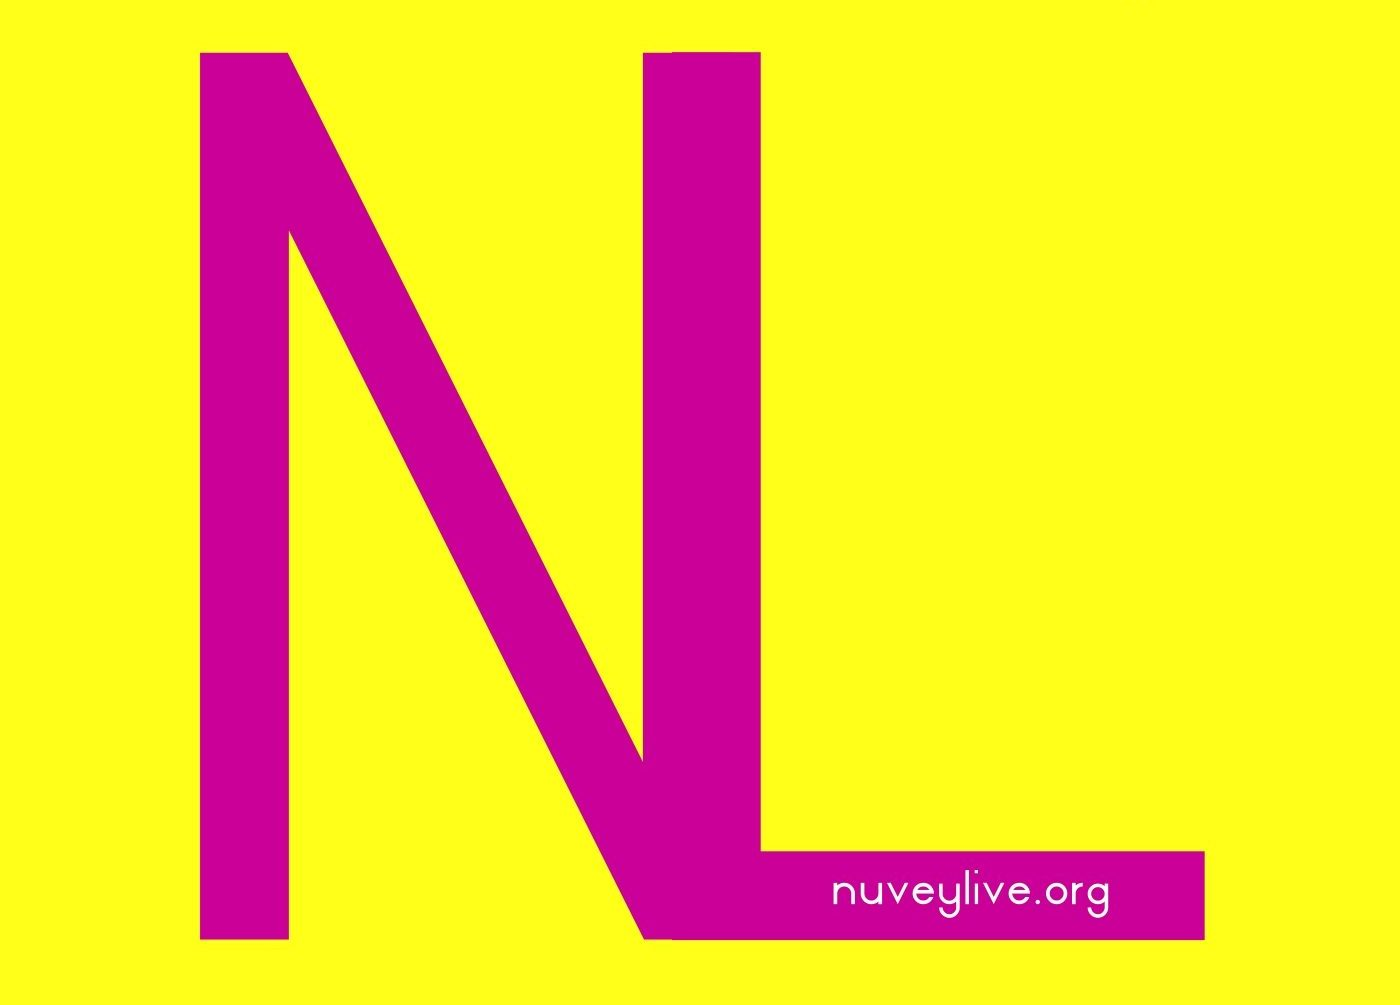 NuveyLive